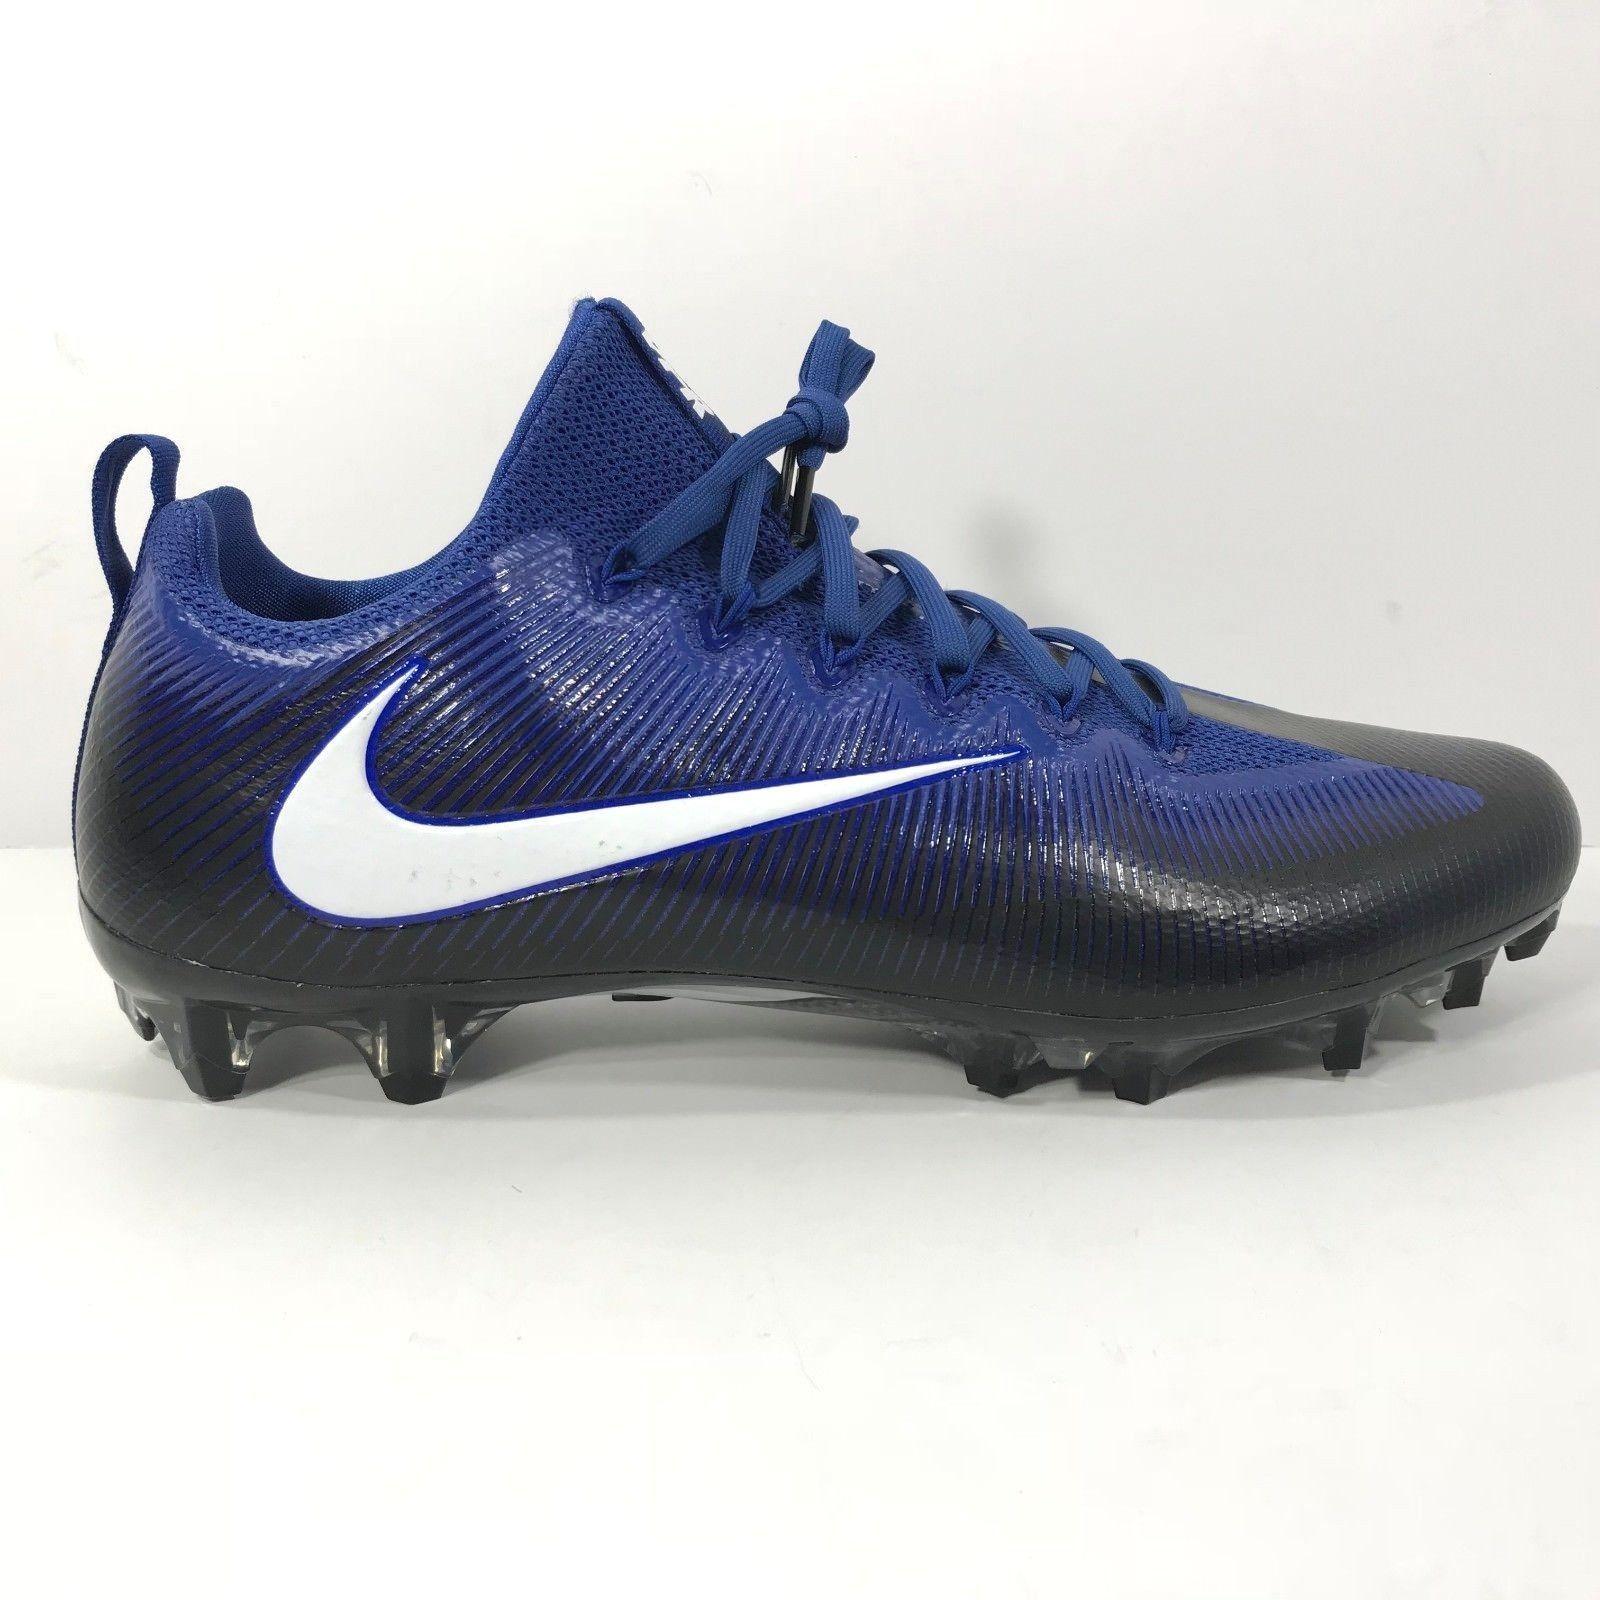 10acbb137627 $120 New Nike Vapor Untouchable Pro PF and 13 similar items. S l1600